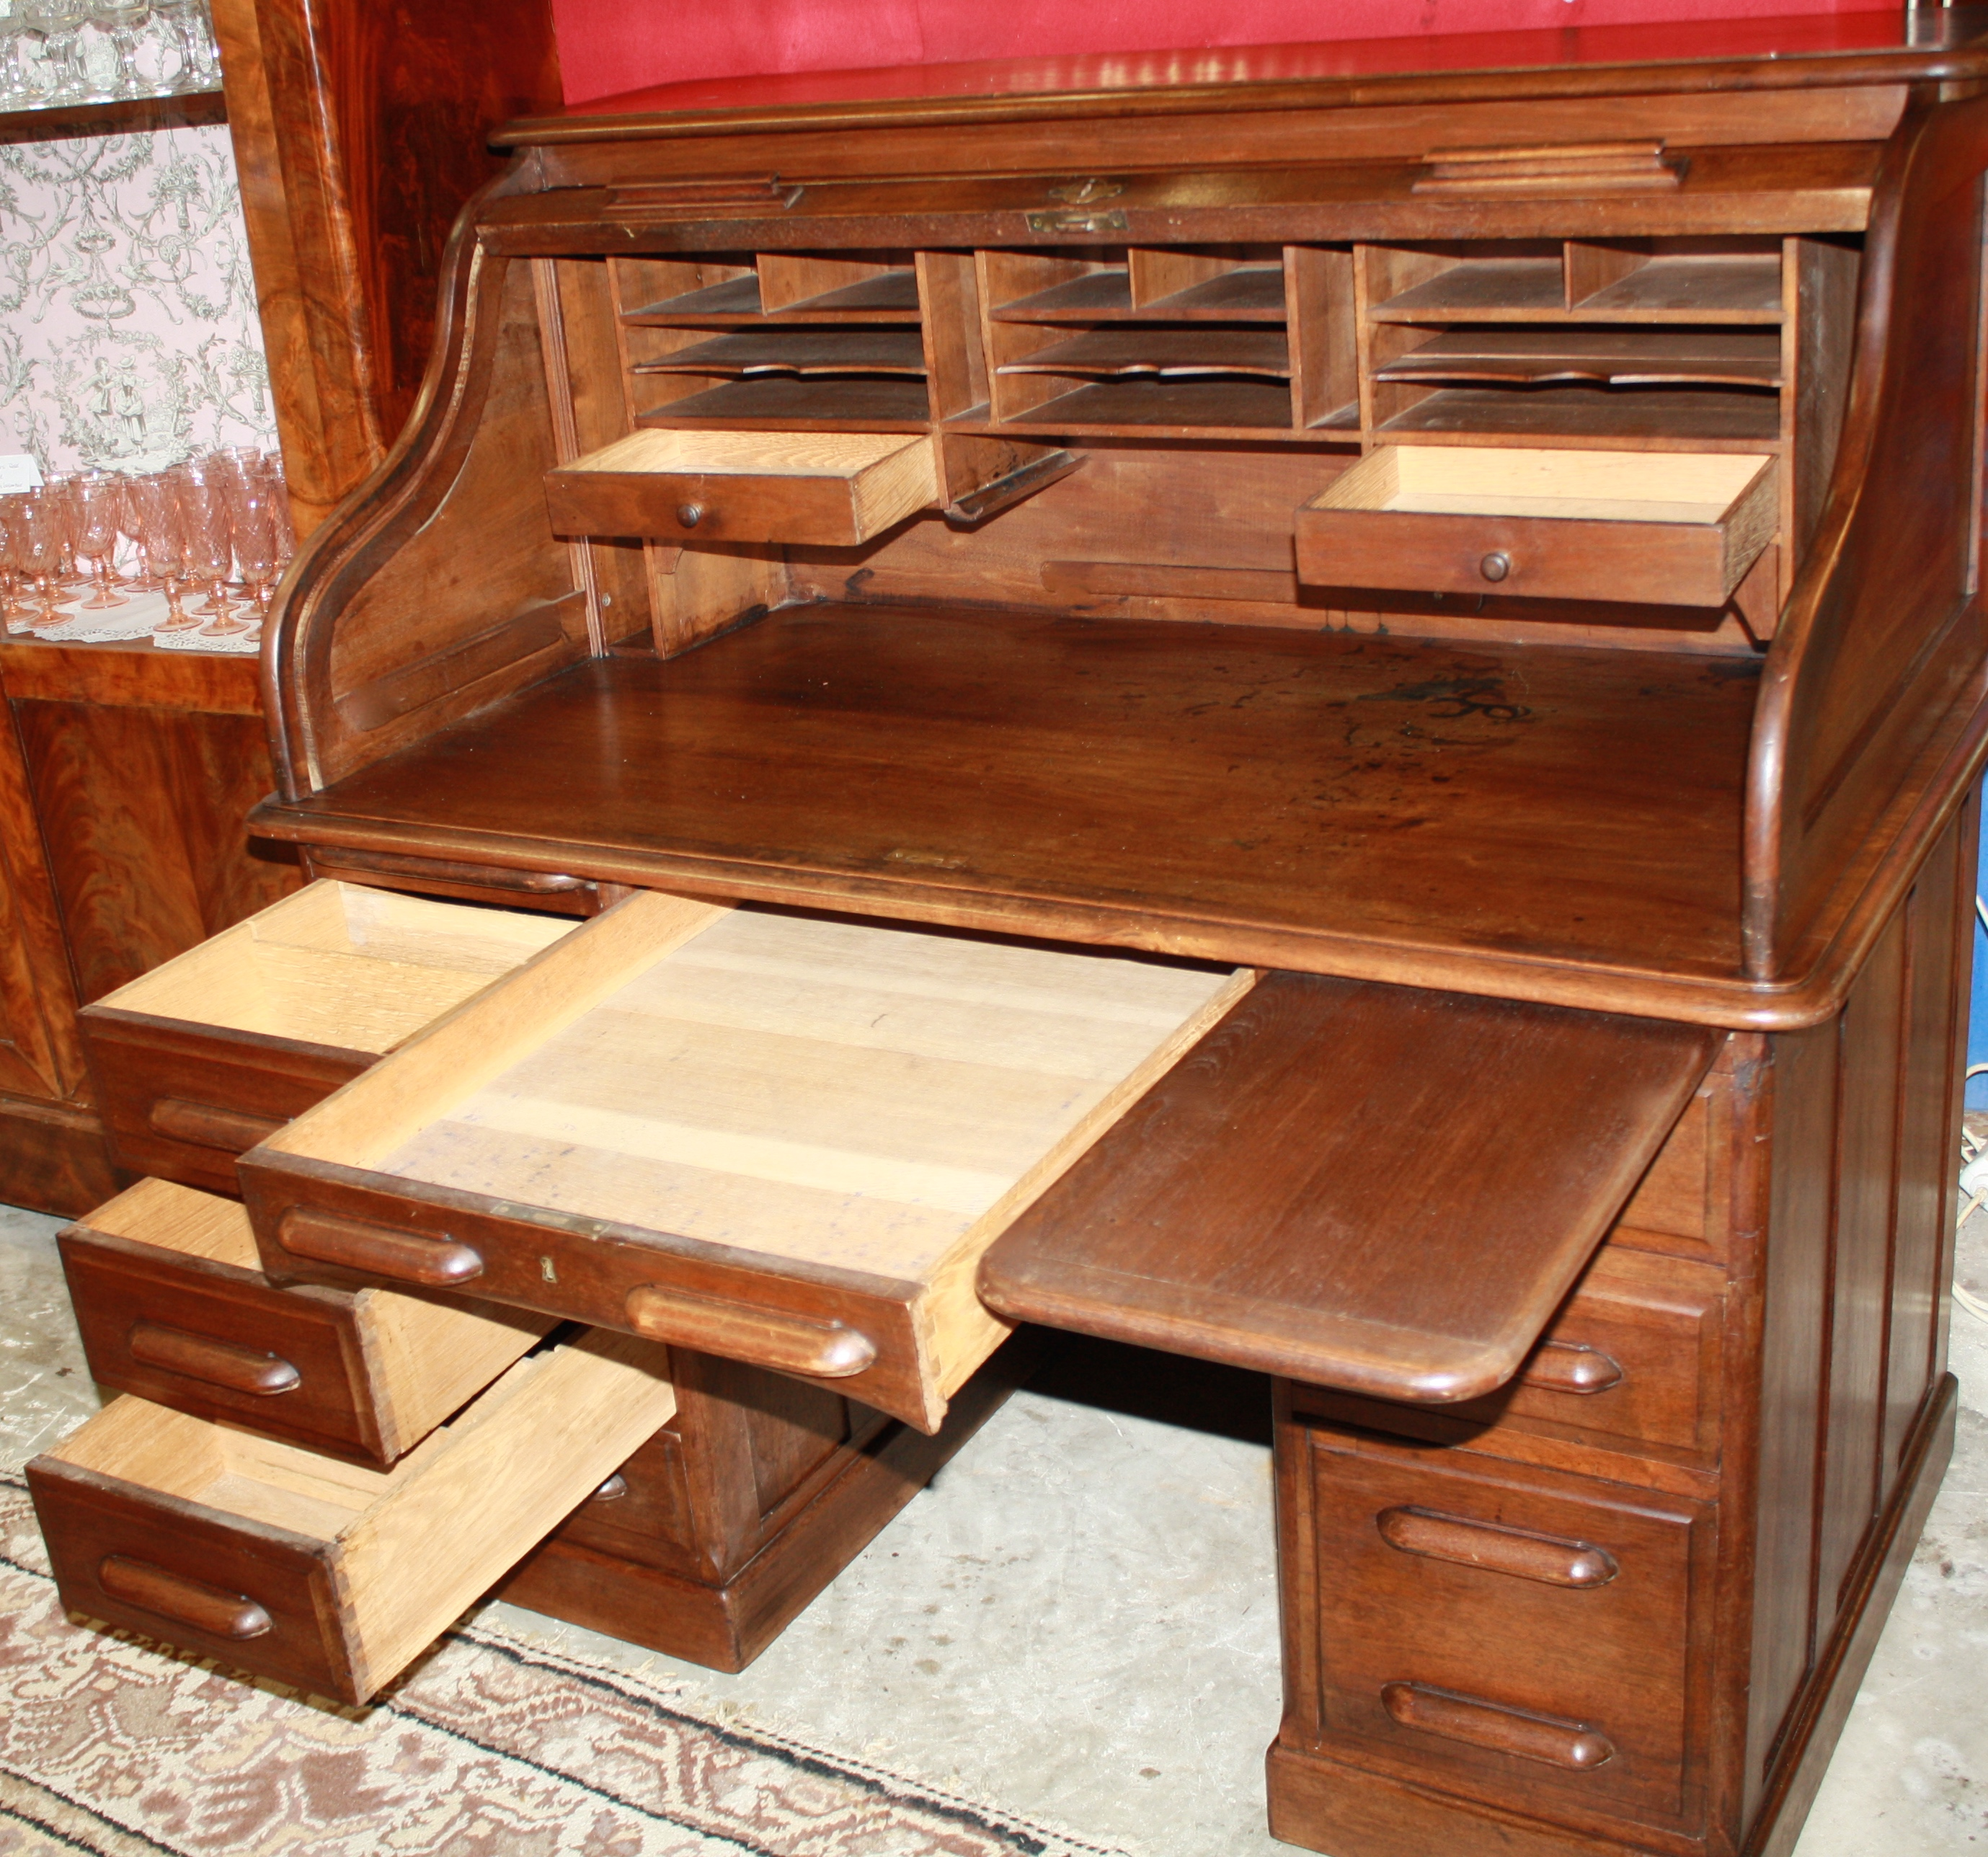 bureau americain bureau americain en chene bureau a rouleau j 39 en r vais un bureau am ricain. Black Bedroom Furniture Sets. Home Design Ideas